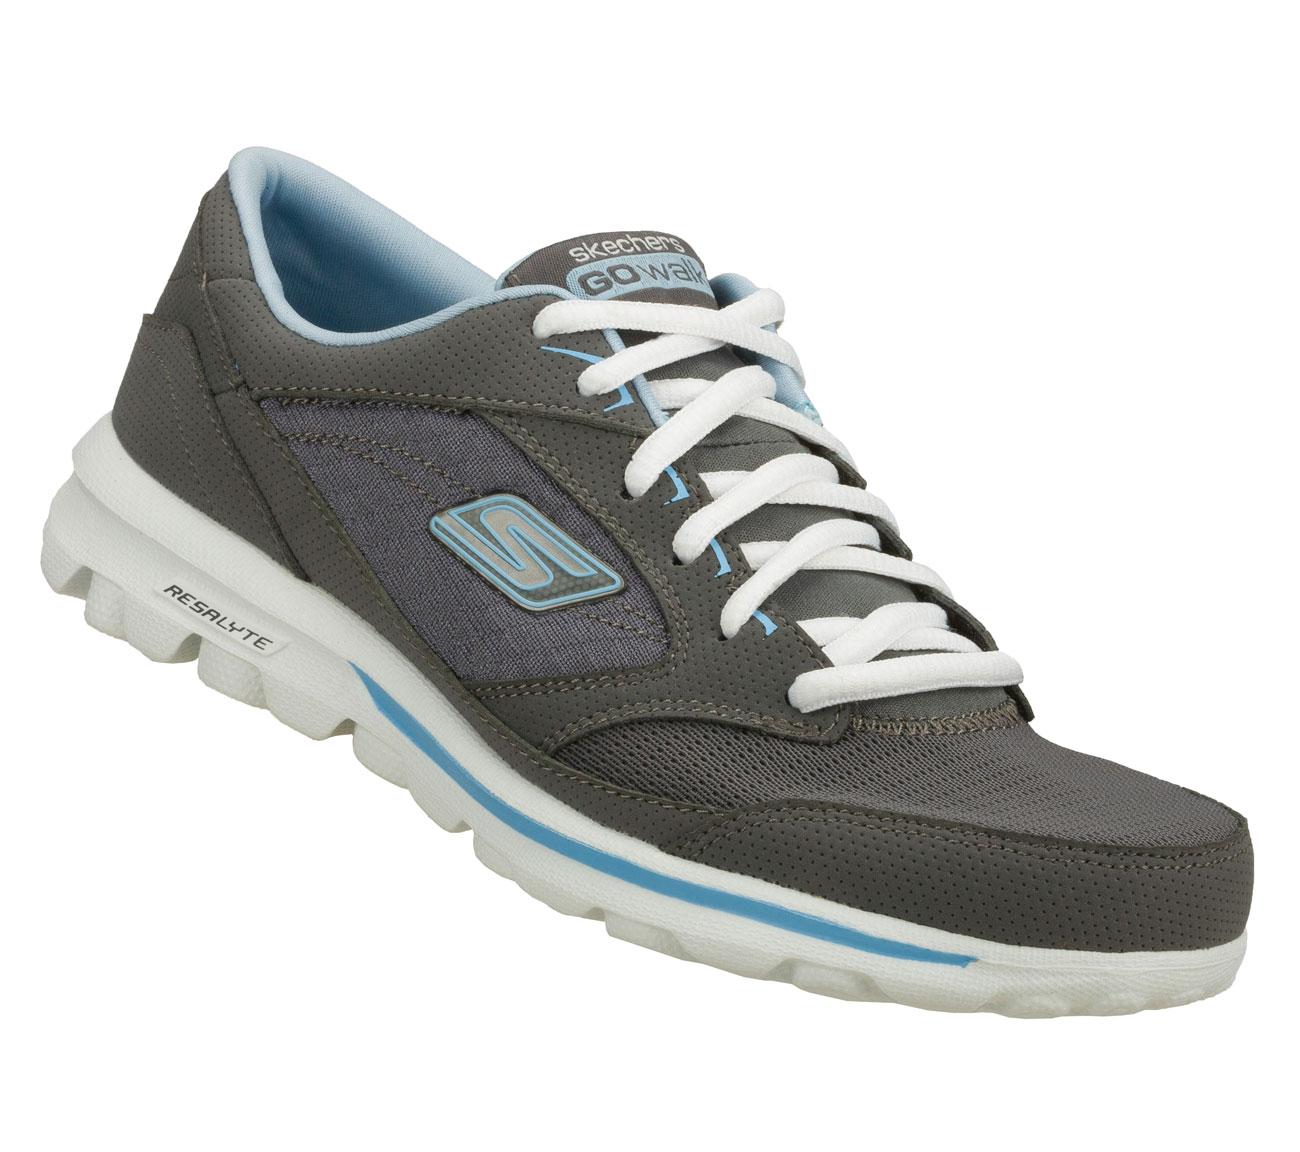 Buy SKECHERS Skechers GOwalk BabyLace Up Sneakers Shoes